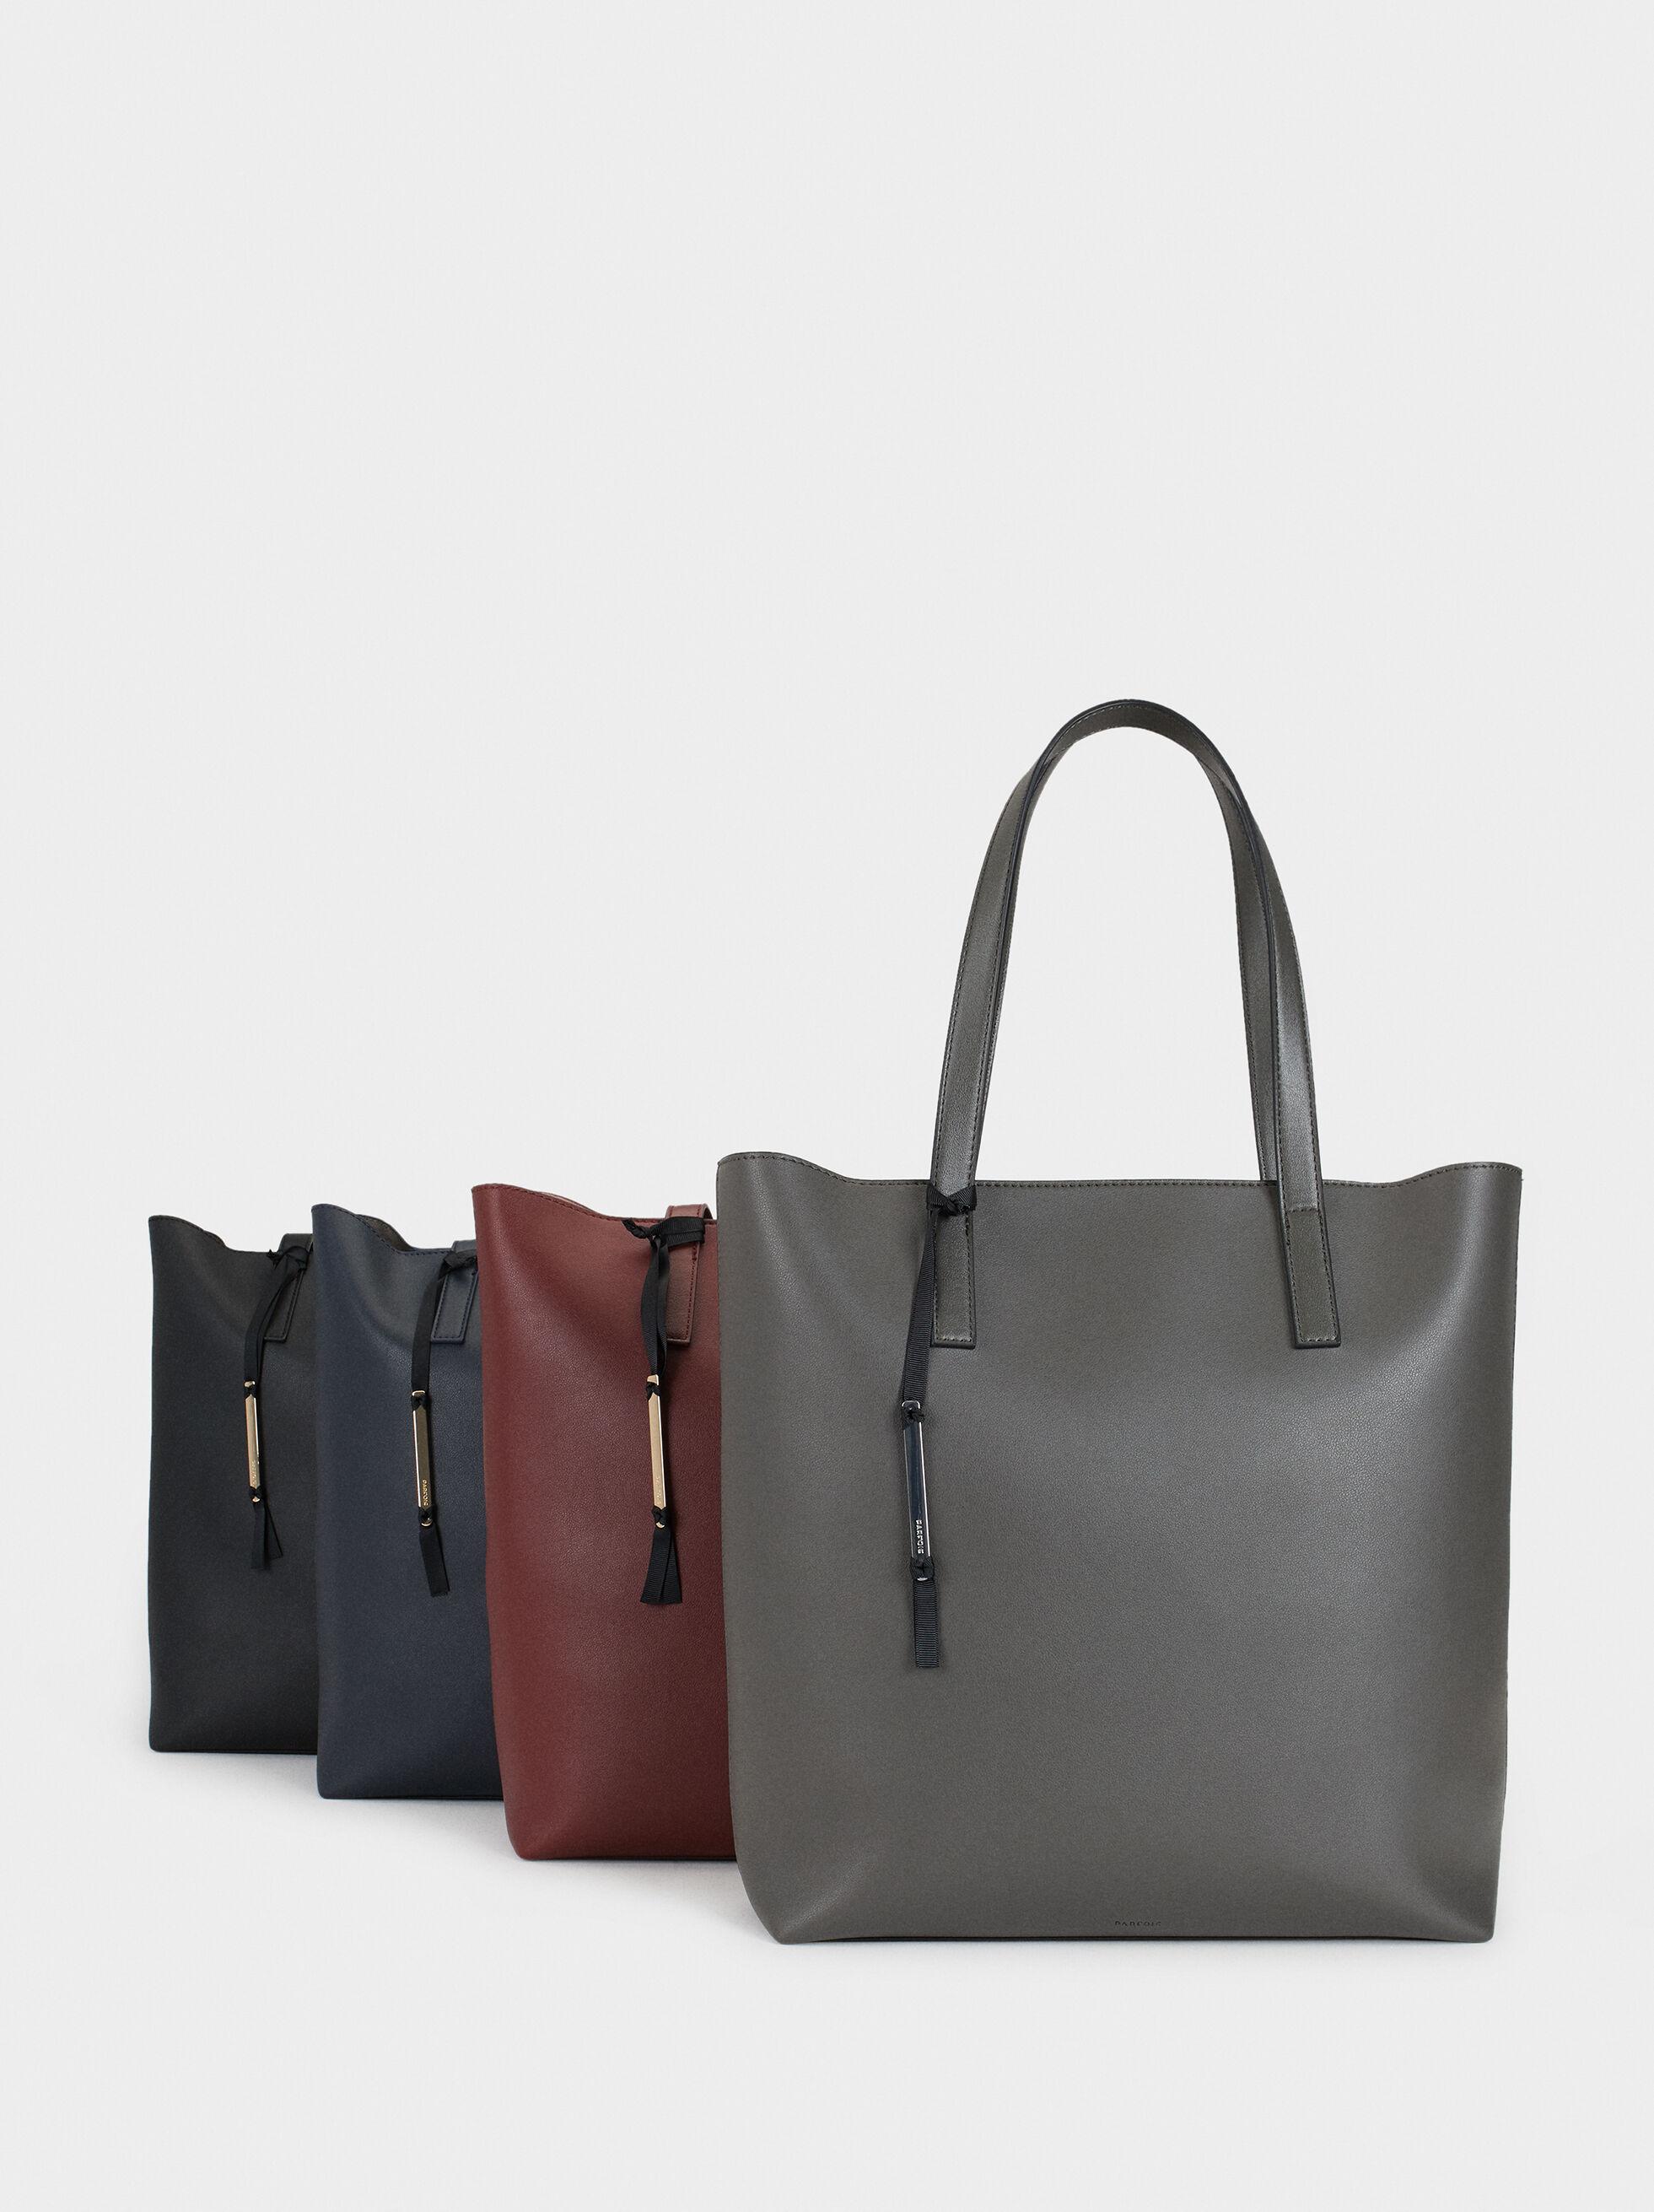 Tote Bag With Metallic Appliqué, , hi-res